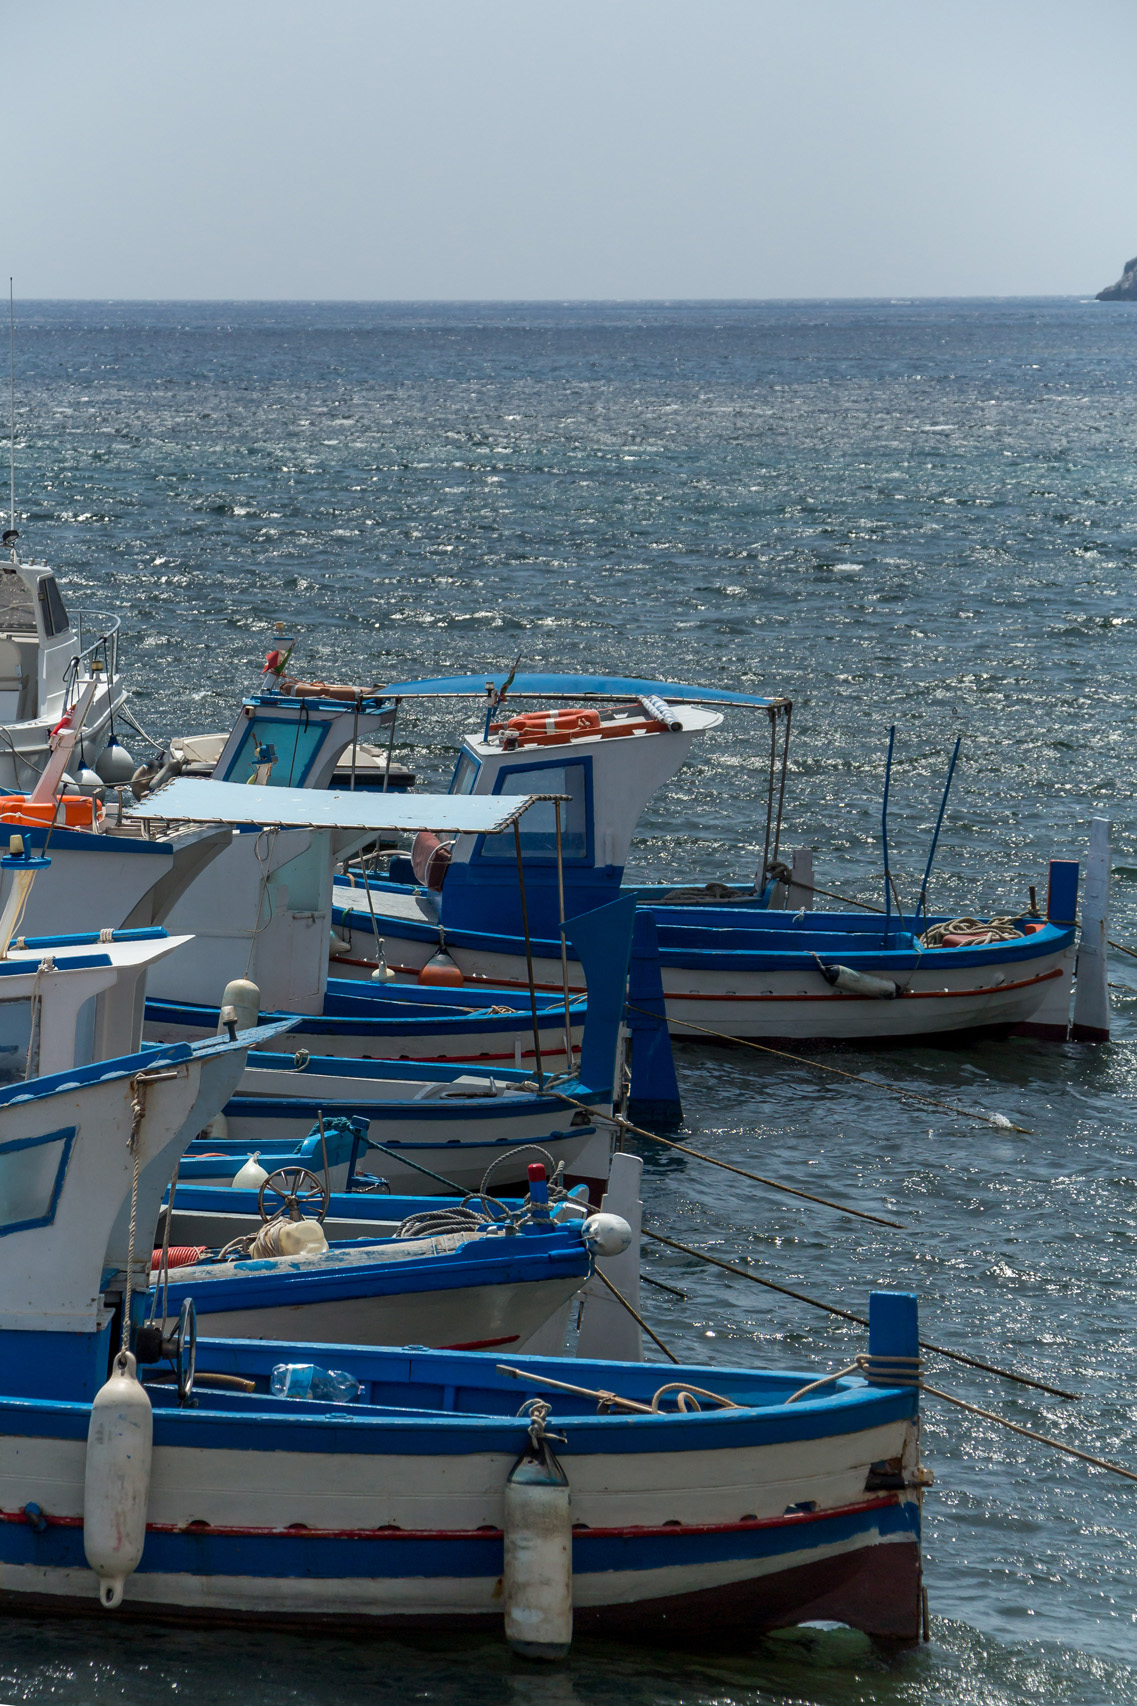 Colorful boats on Marettimo island, Sicily